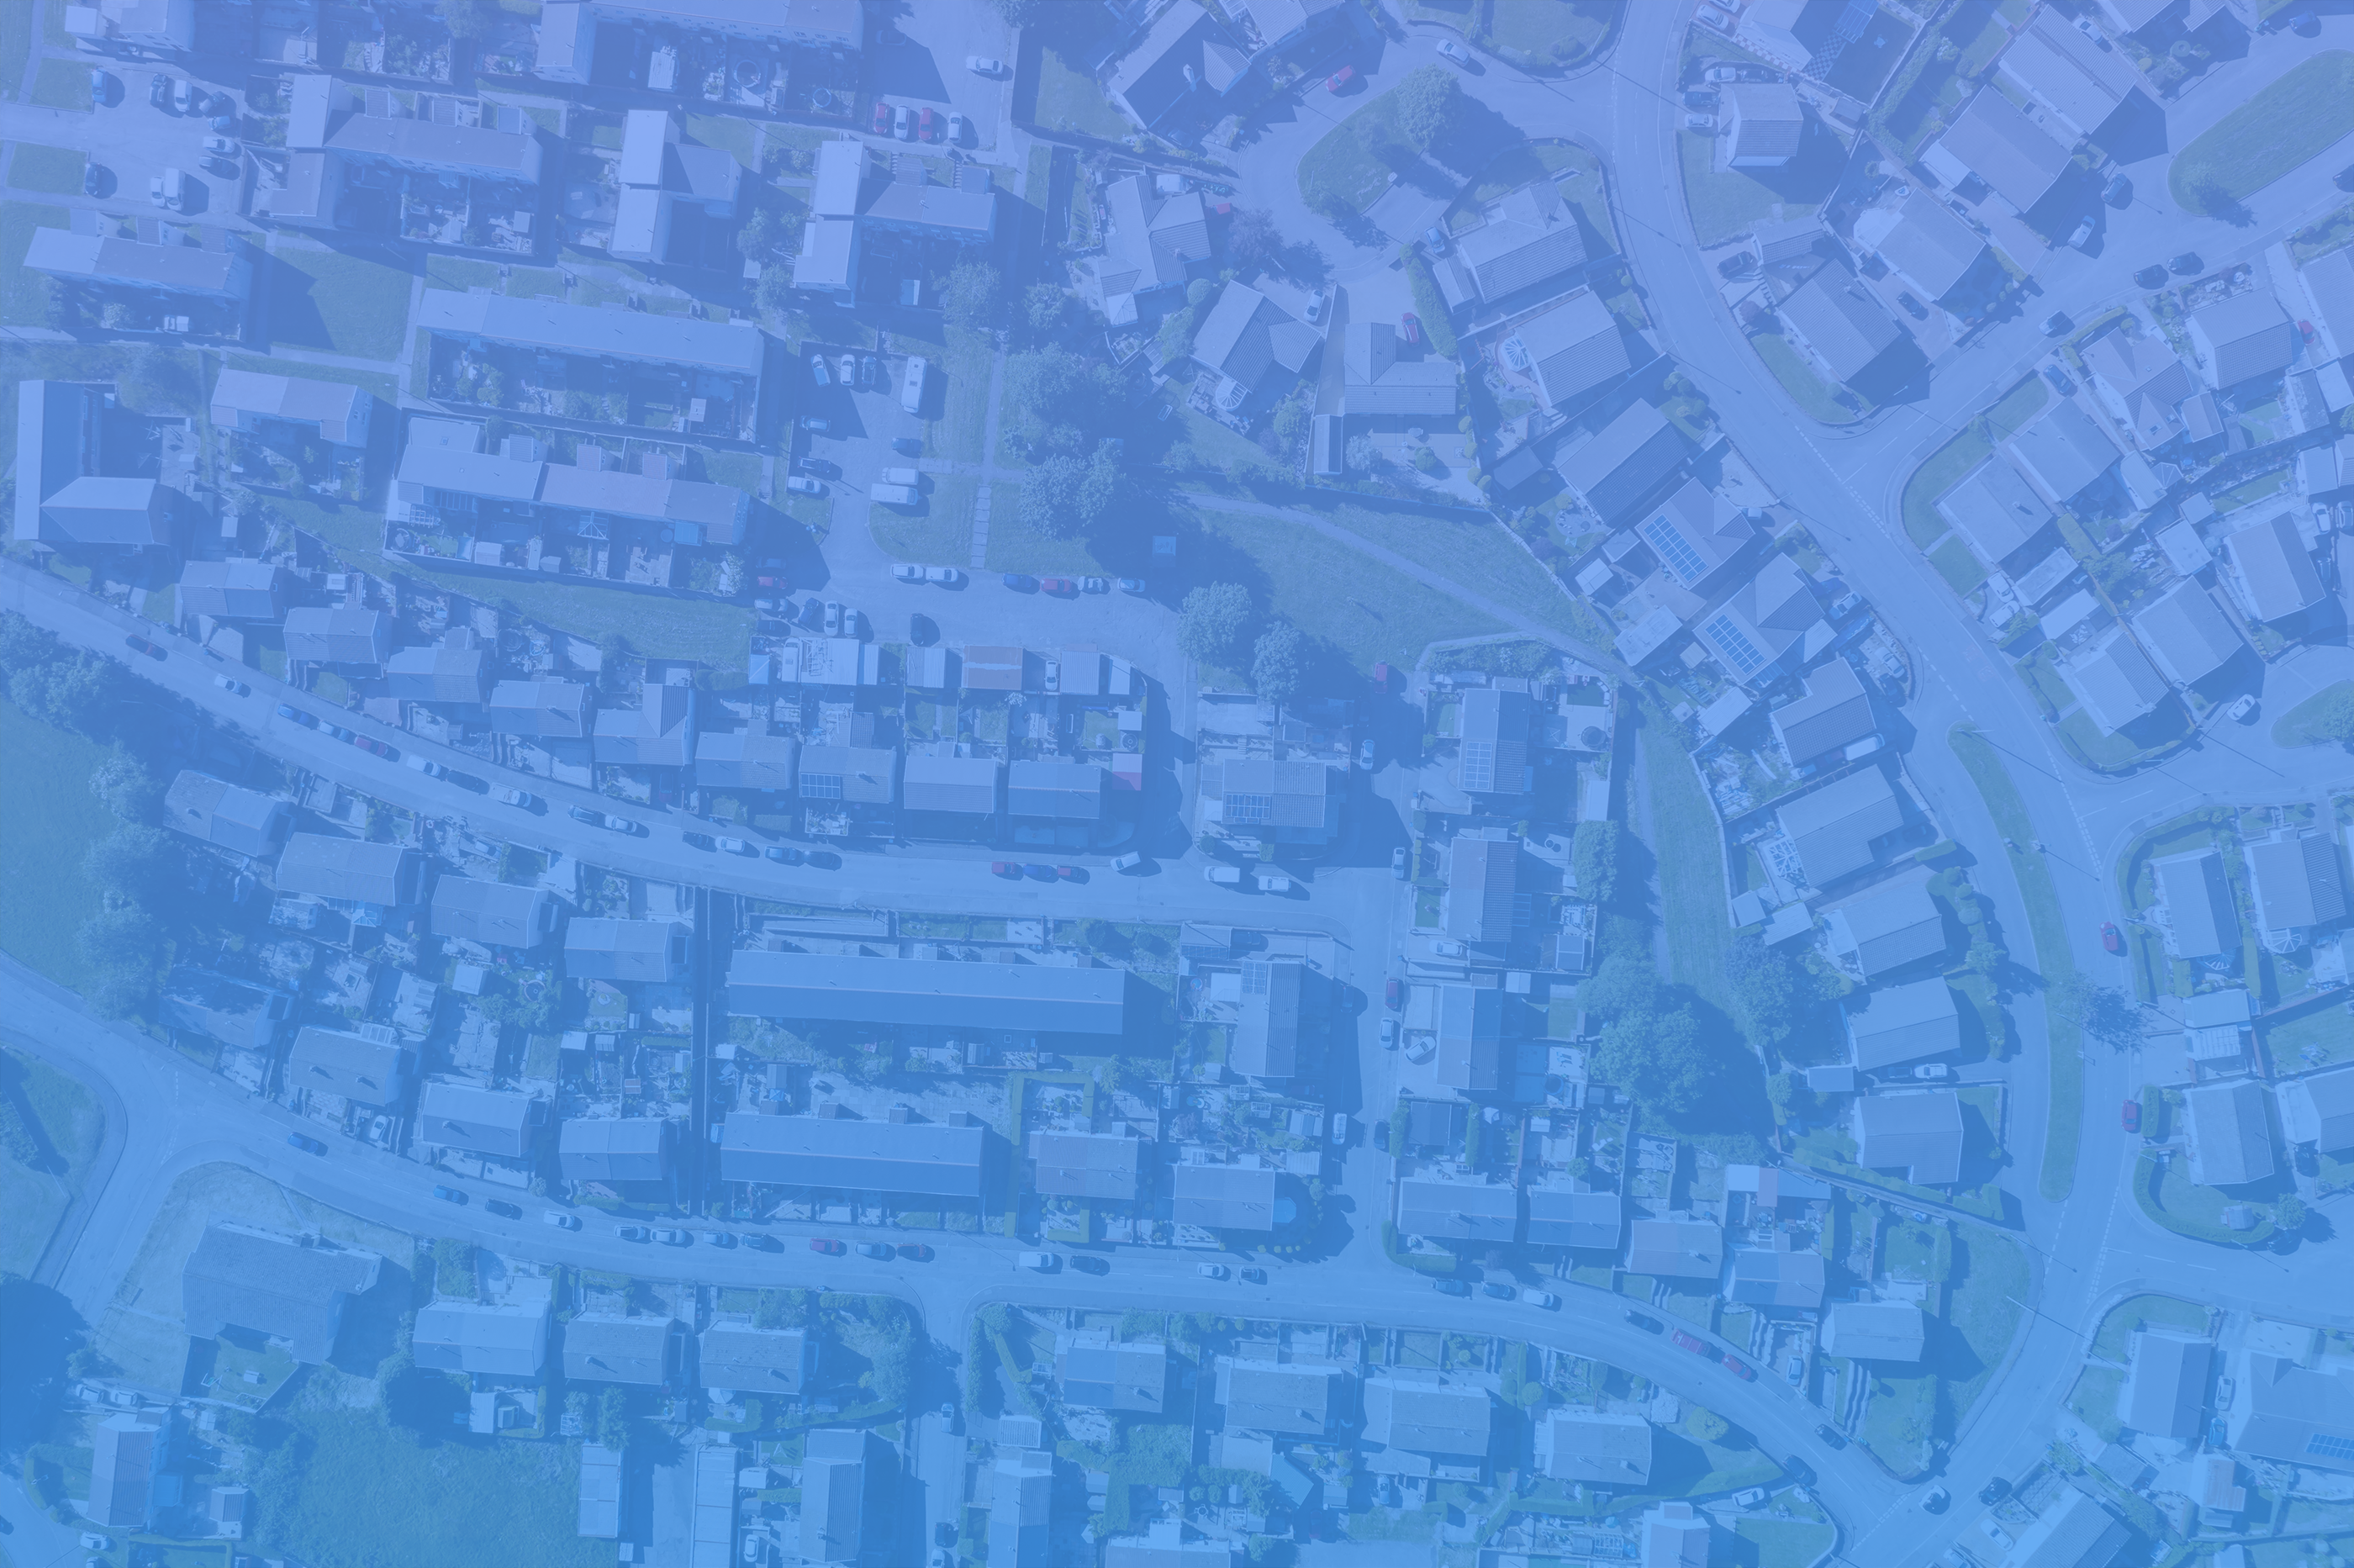 real estate leads birds eye view neighborhood blue ovrly